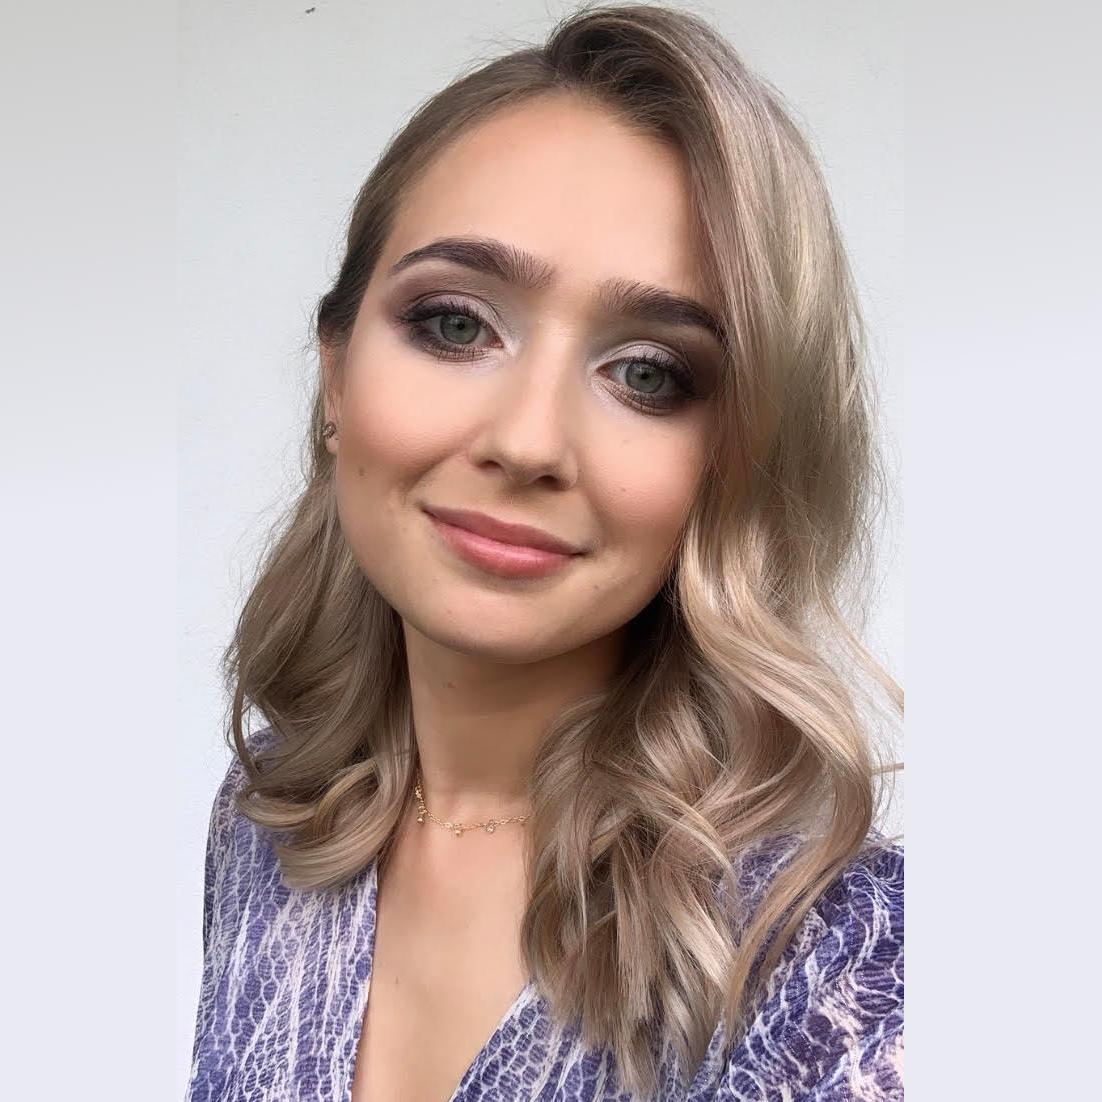 Kamila Niewiadomy